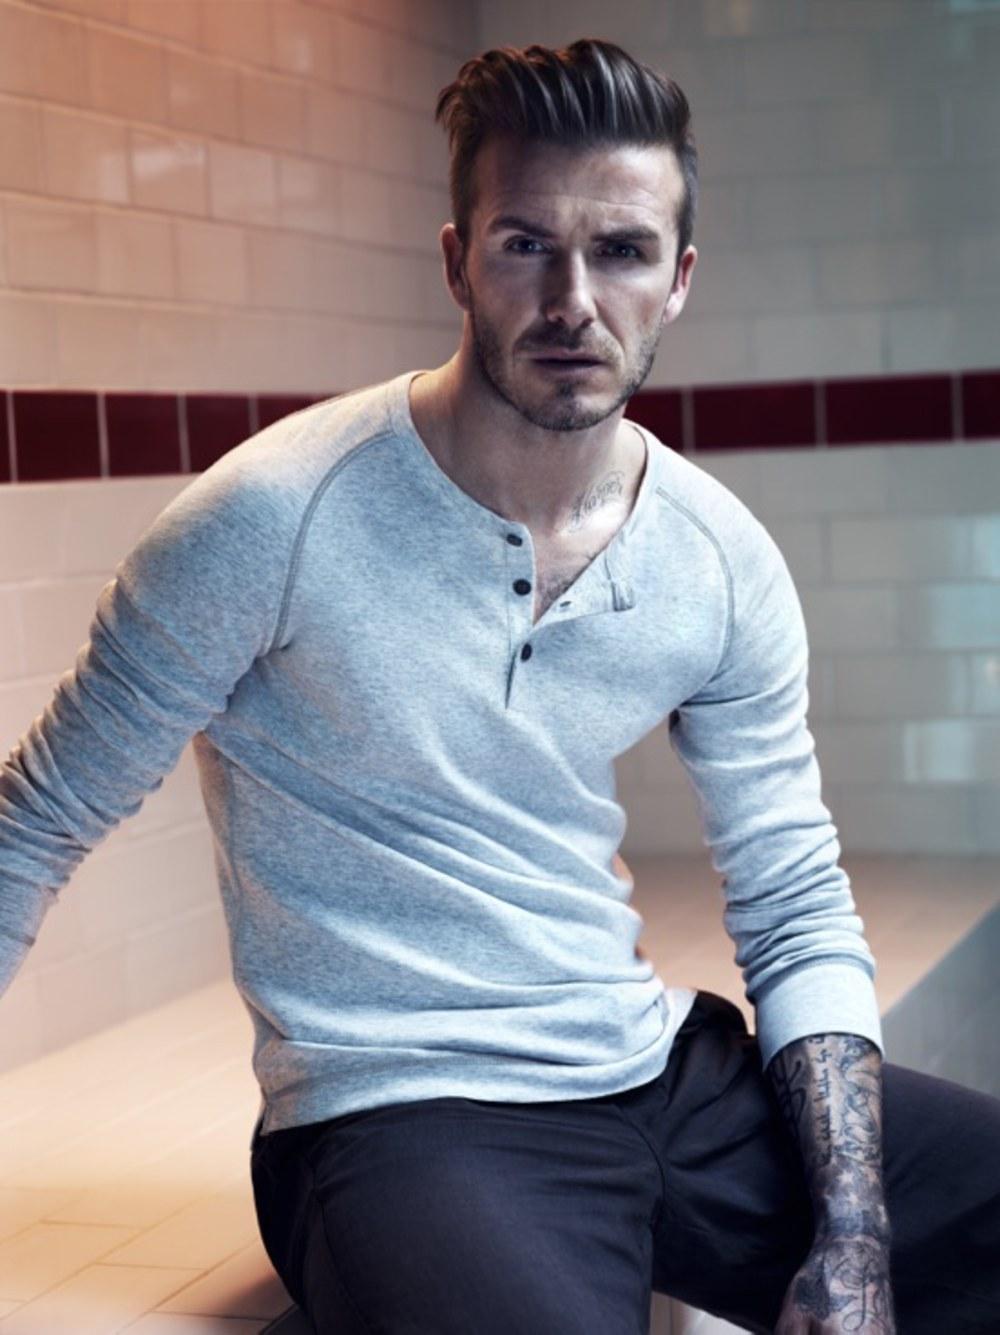 david-beckham-para-la-campana-de-h-m-bodywear